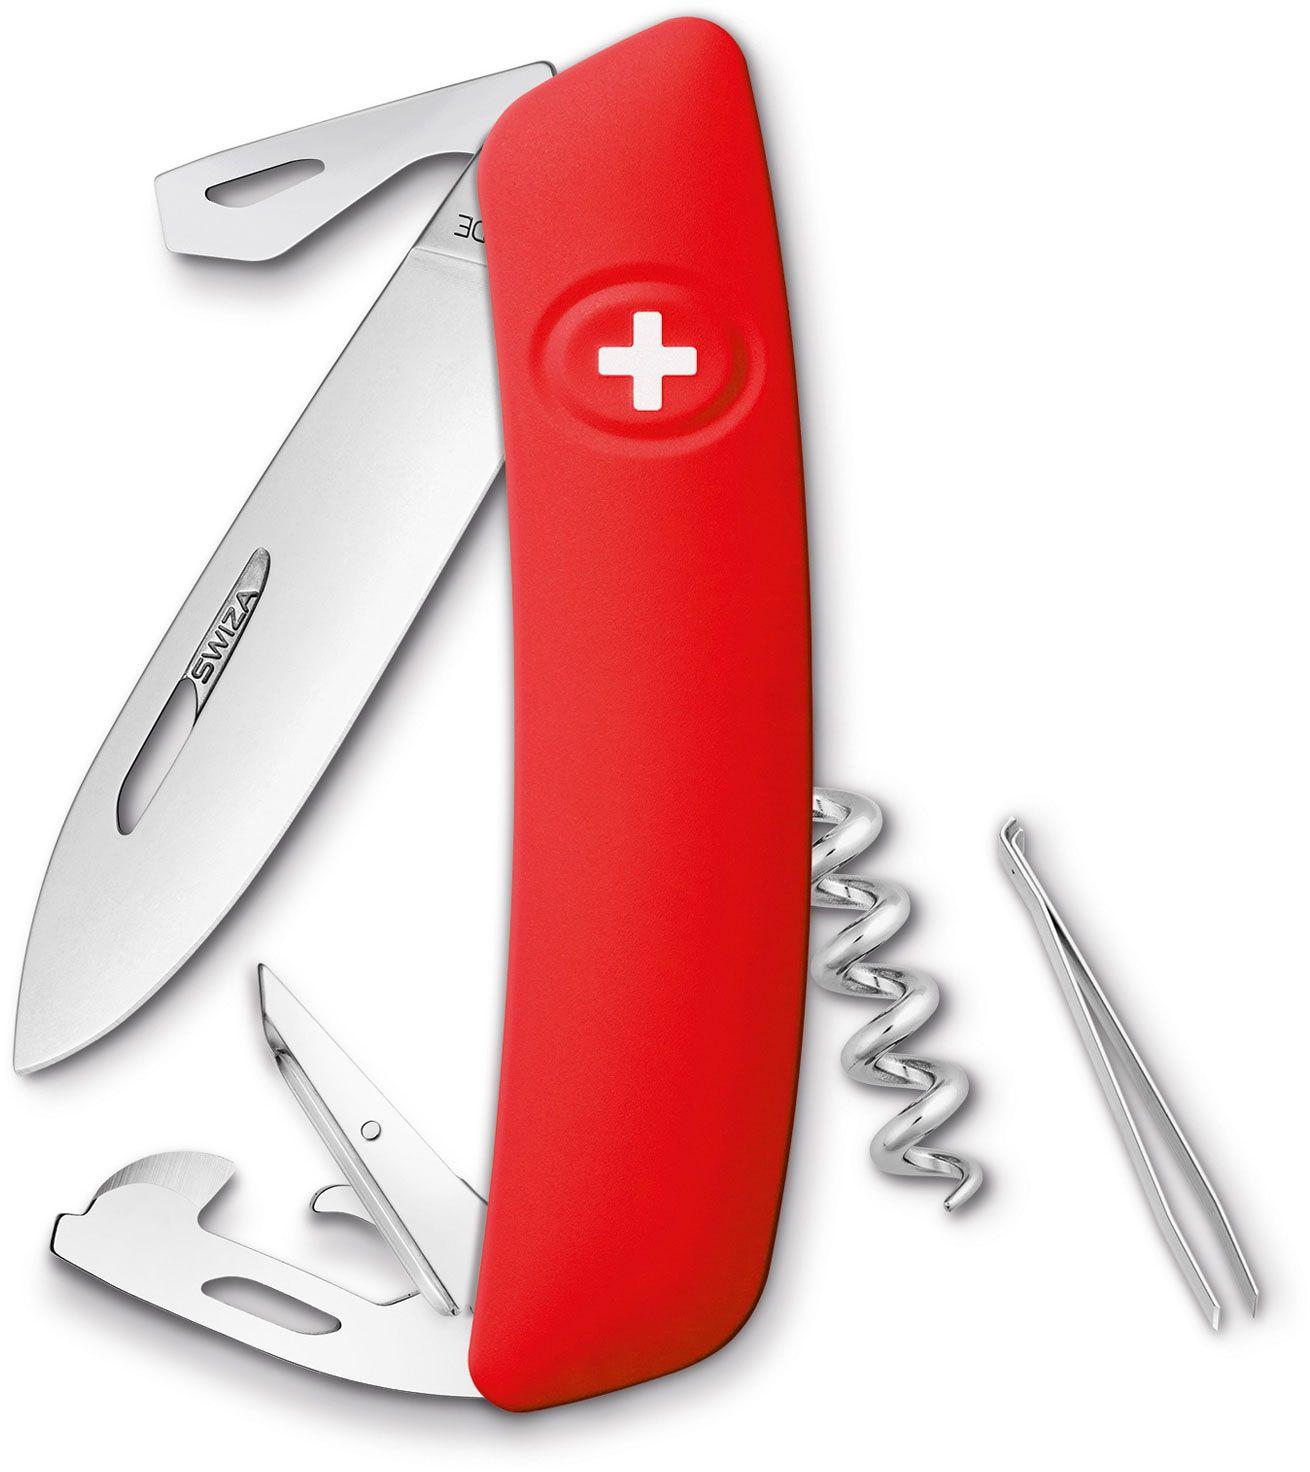 SWIZA D03 Swiss Pocket Knife Multi-Tool, Red, 2.95 inch Plain Blade